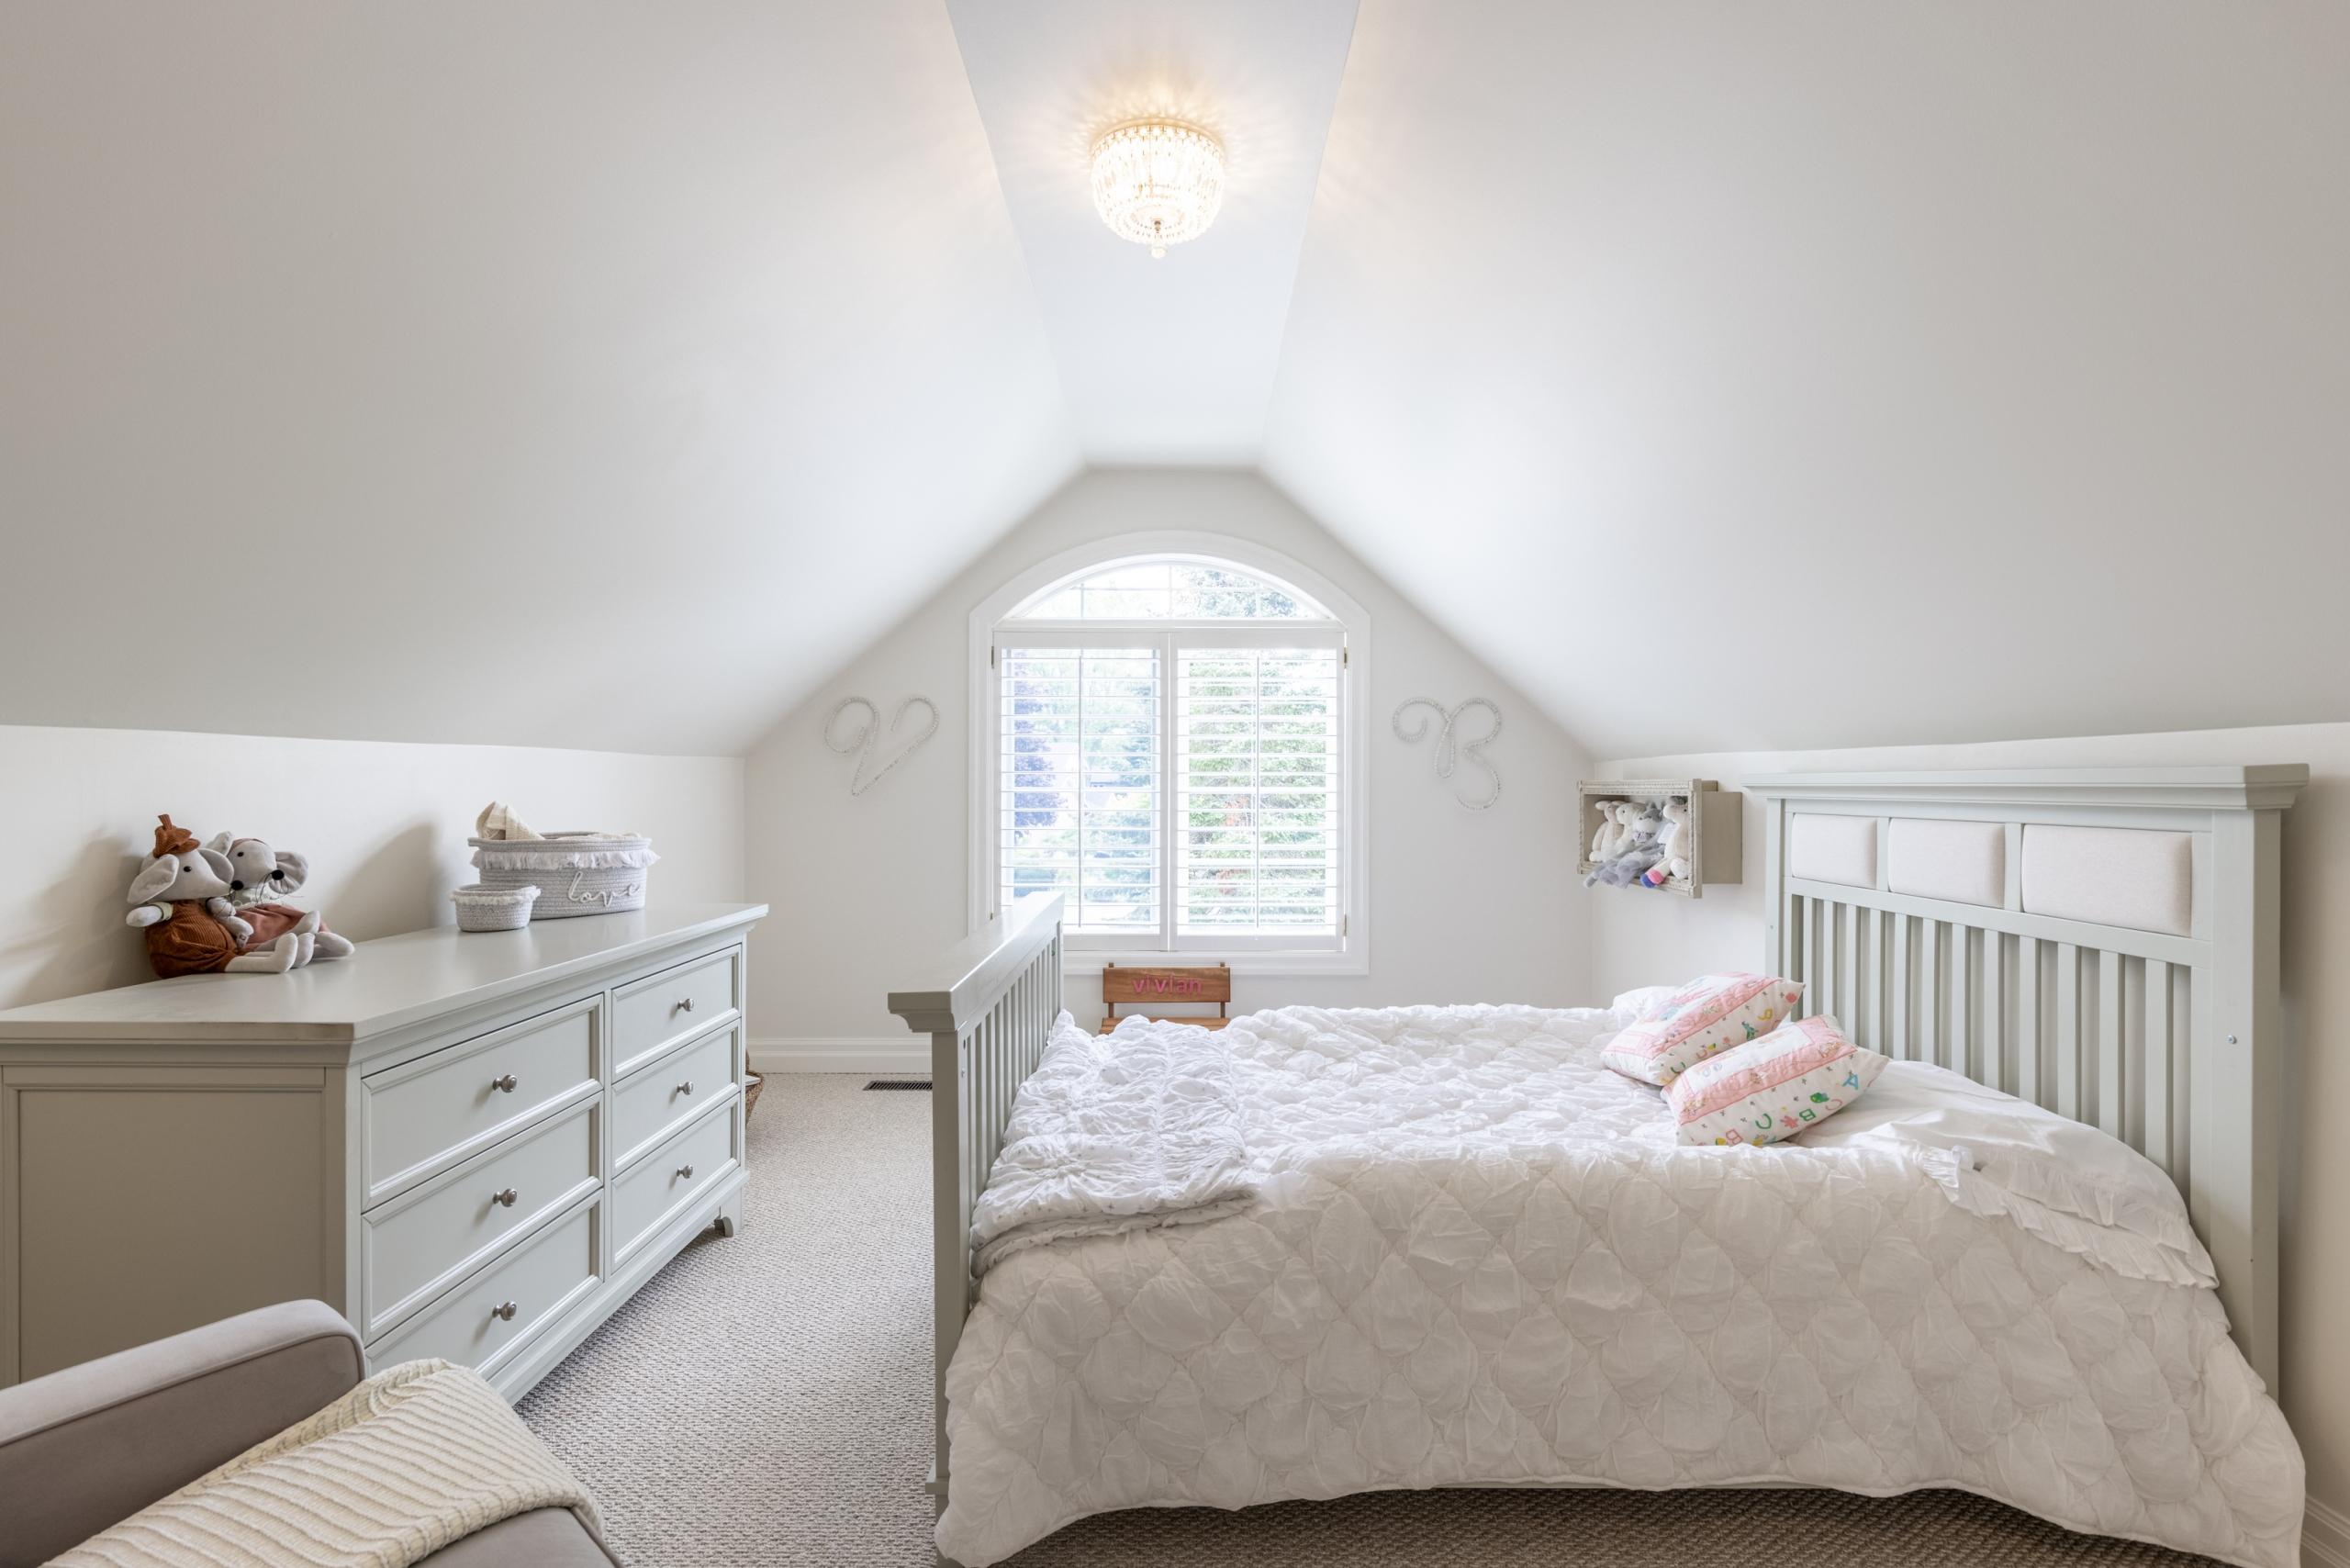 Bedroom featured at 956 Halsham Court, Mississauga at Alex Irish & Associates